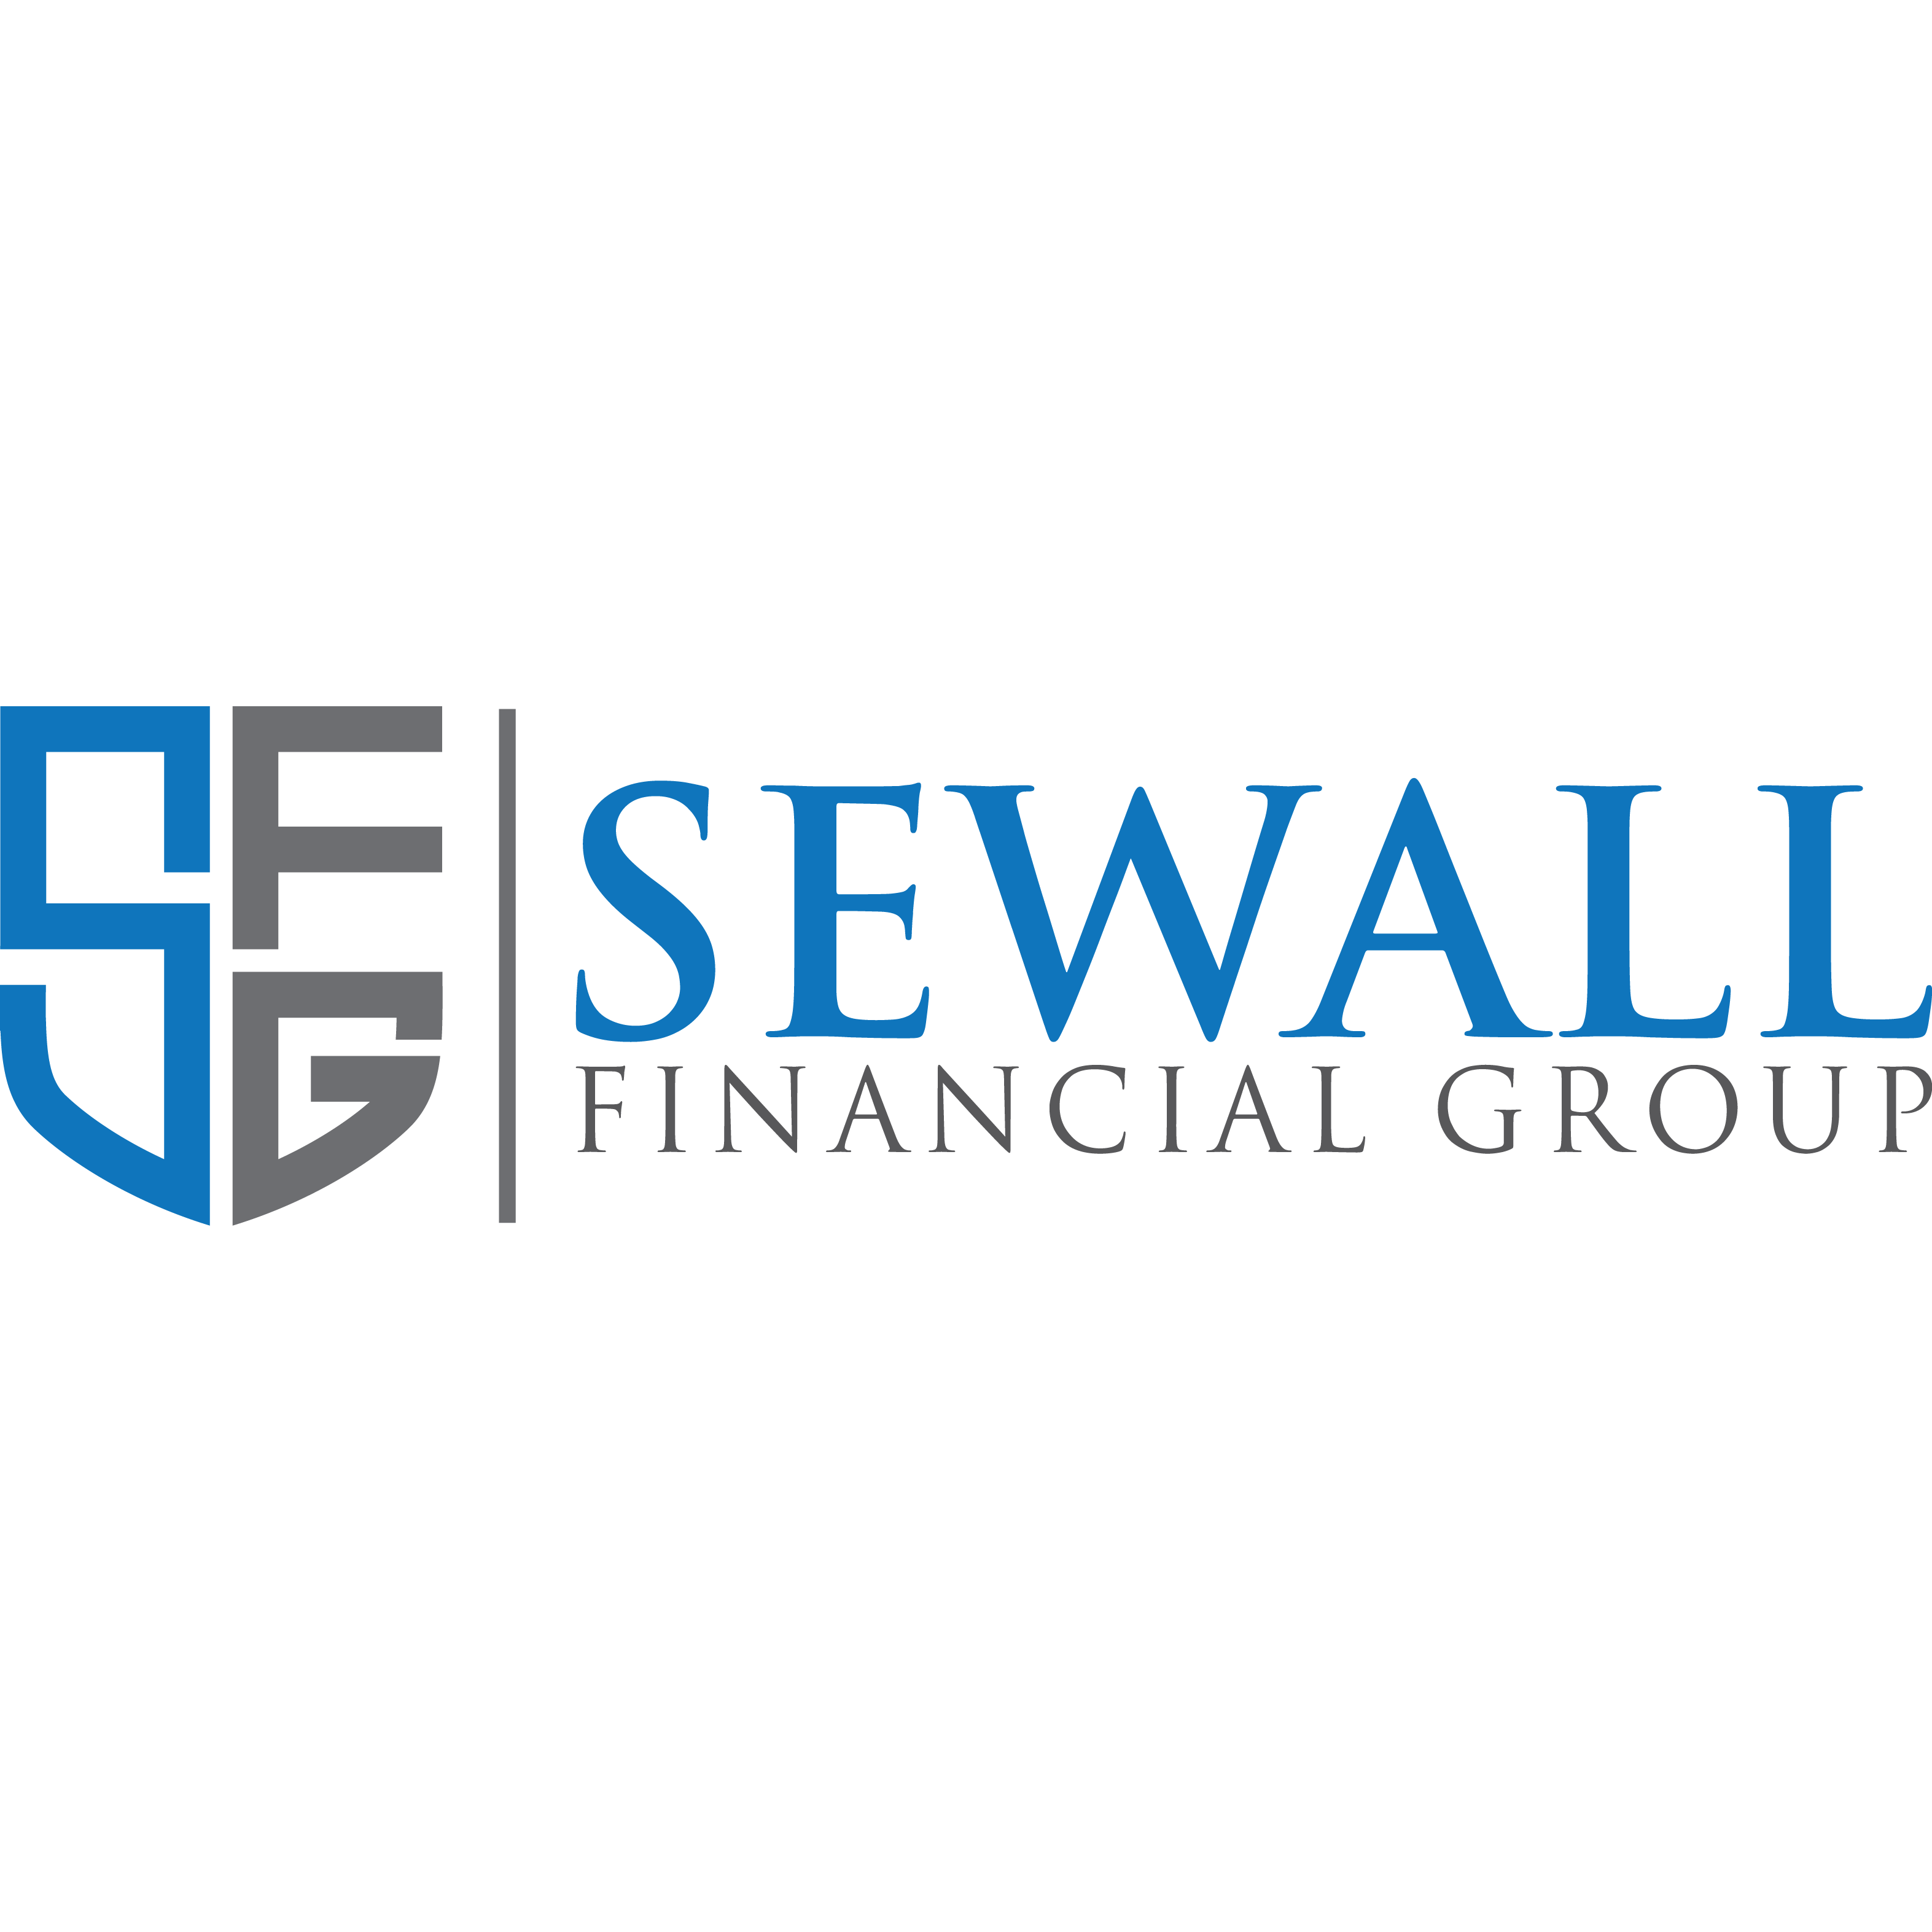 Sewall Financial Group